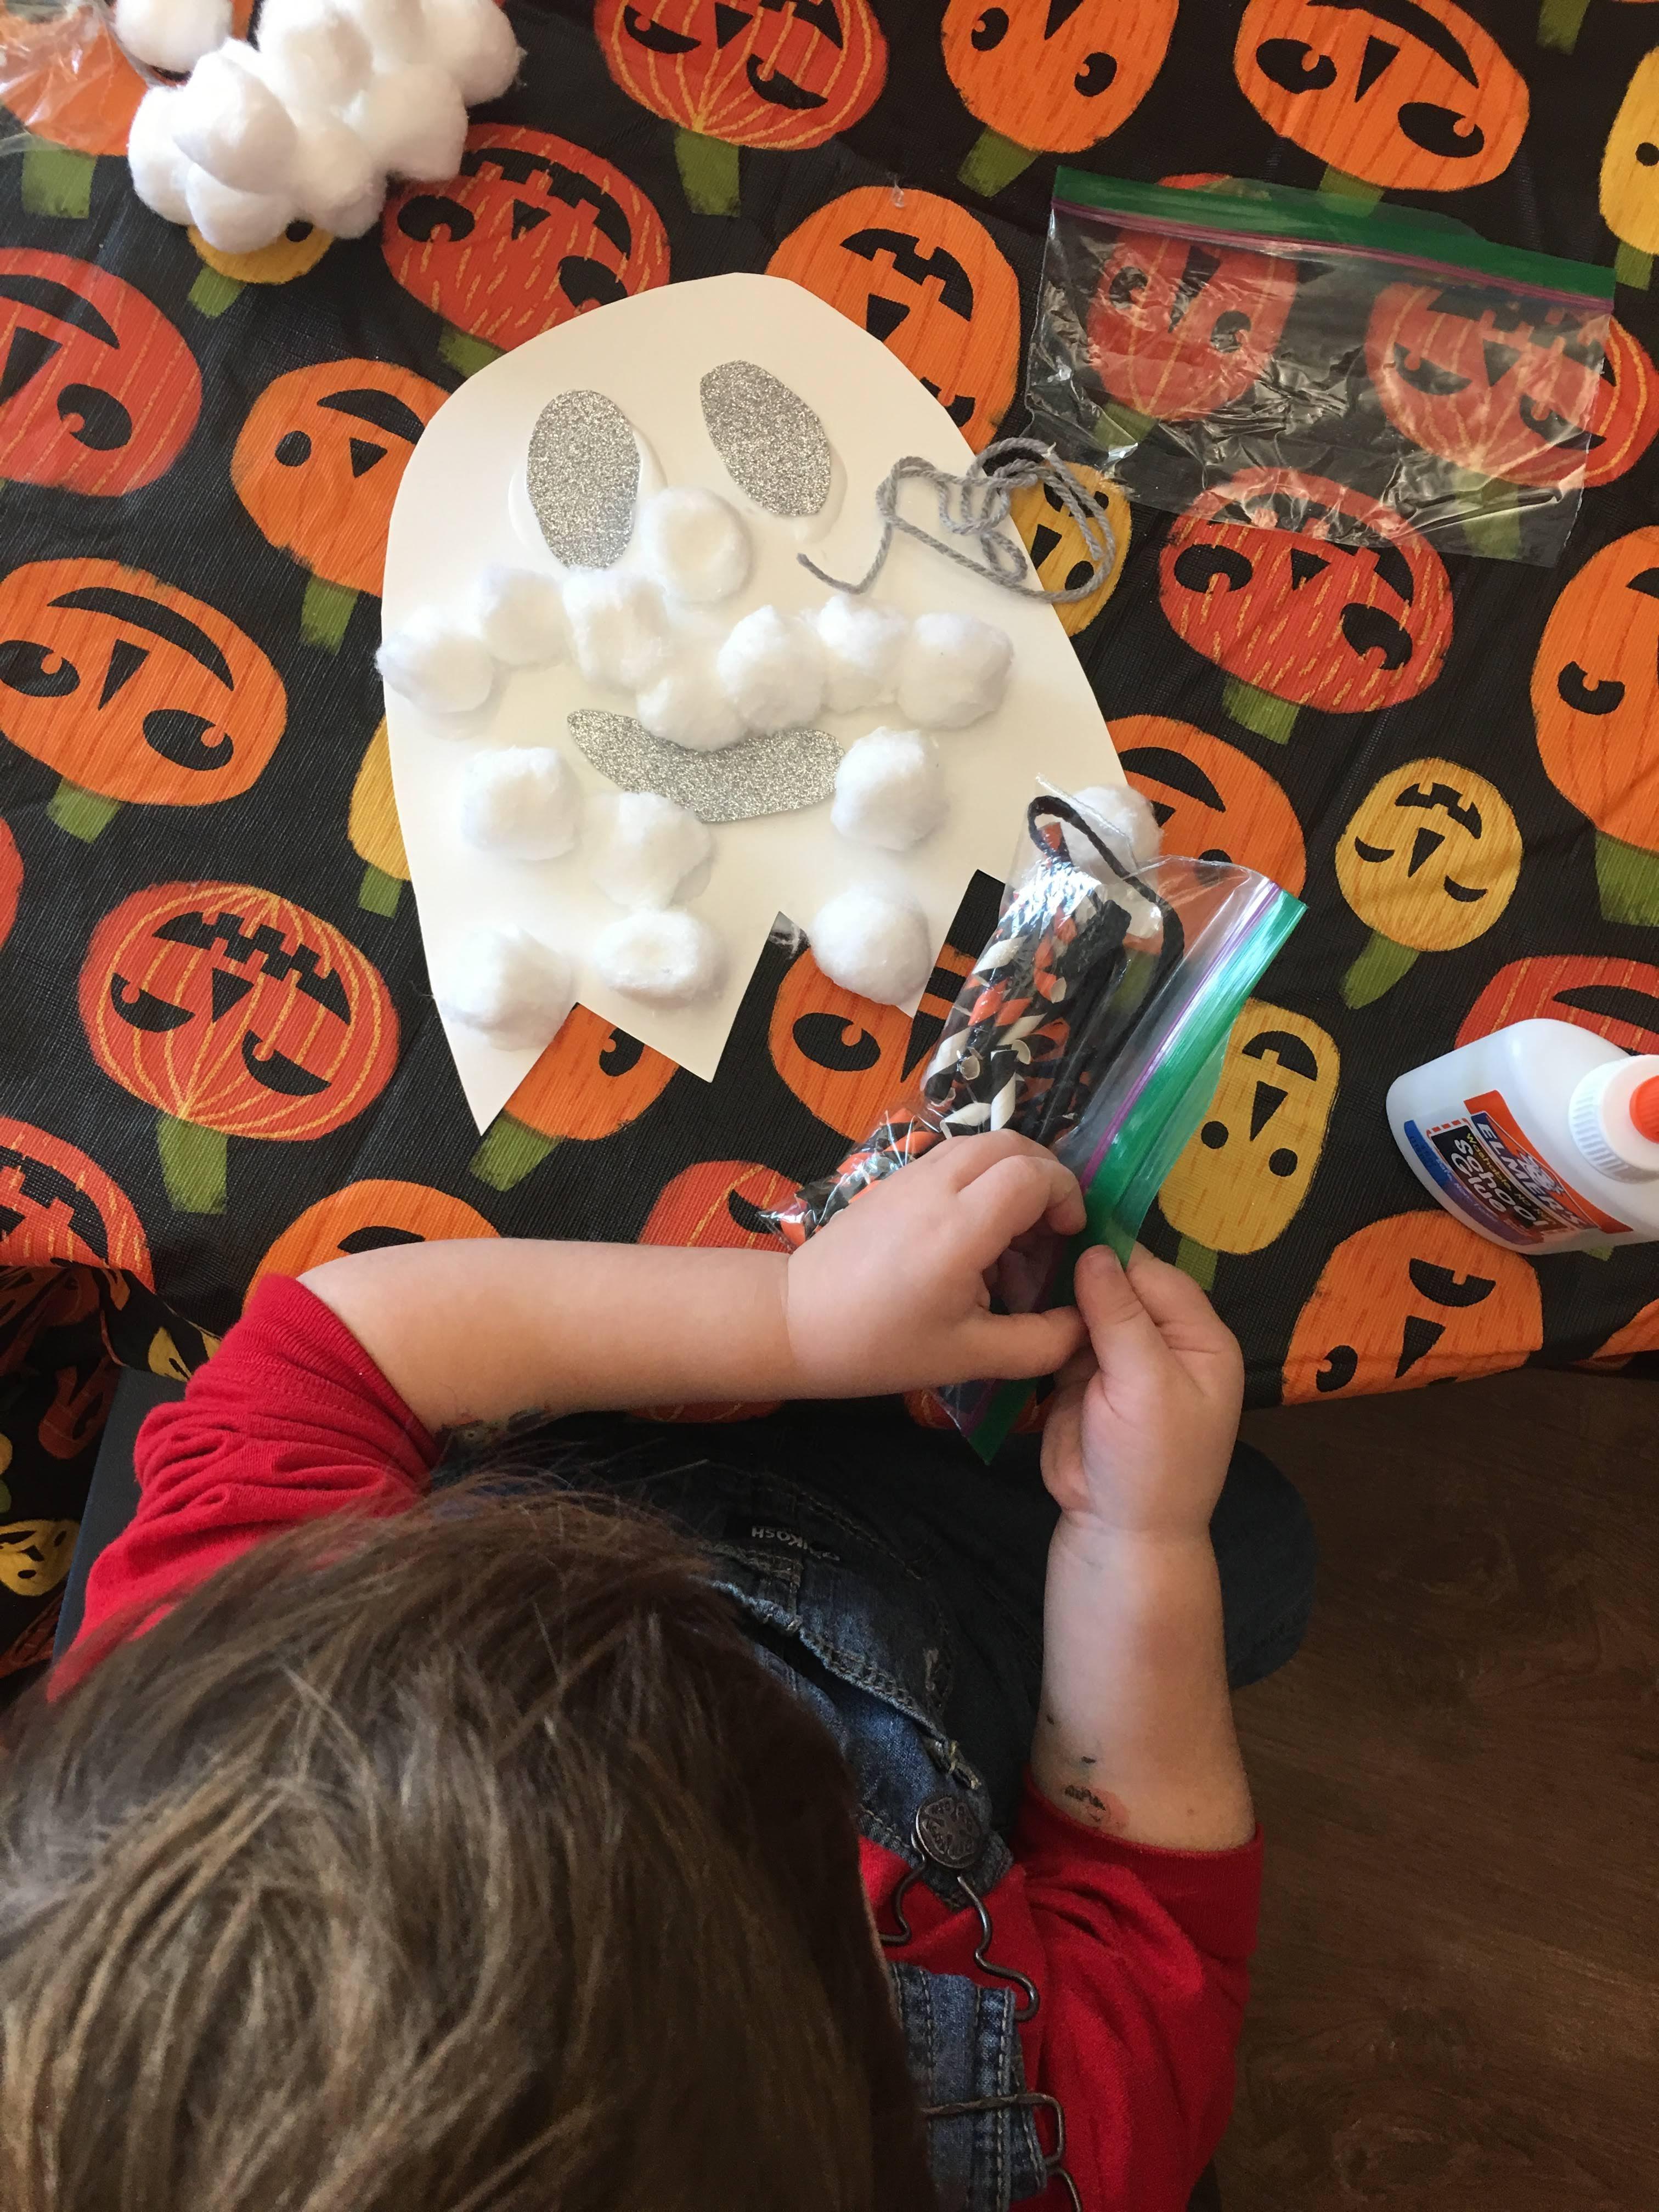 Preschool Halloween Party Plans: A full plan for a preschool Halloween party! Looking for preschool Halloween party ideas? Here's everything you need to plan a preschool Halloween party! #preschool #halloweenparty #halloween